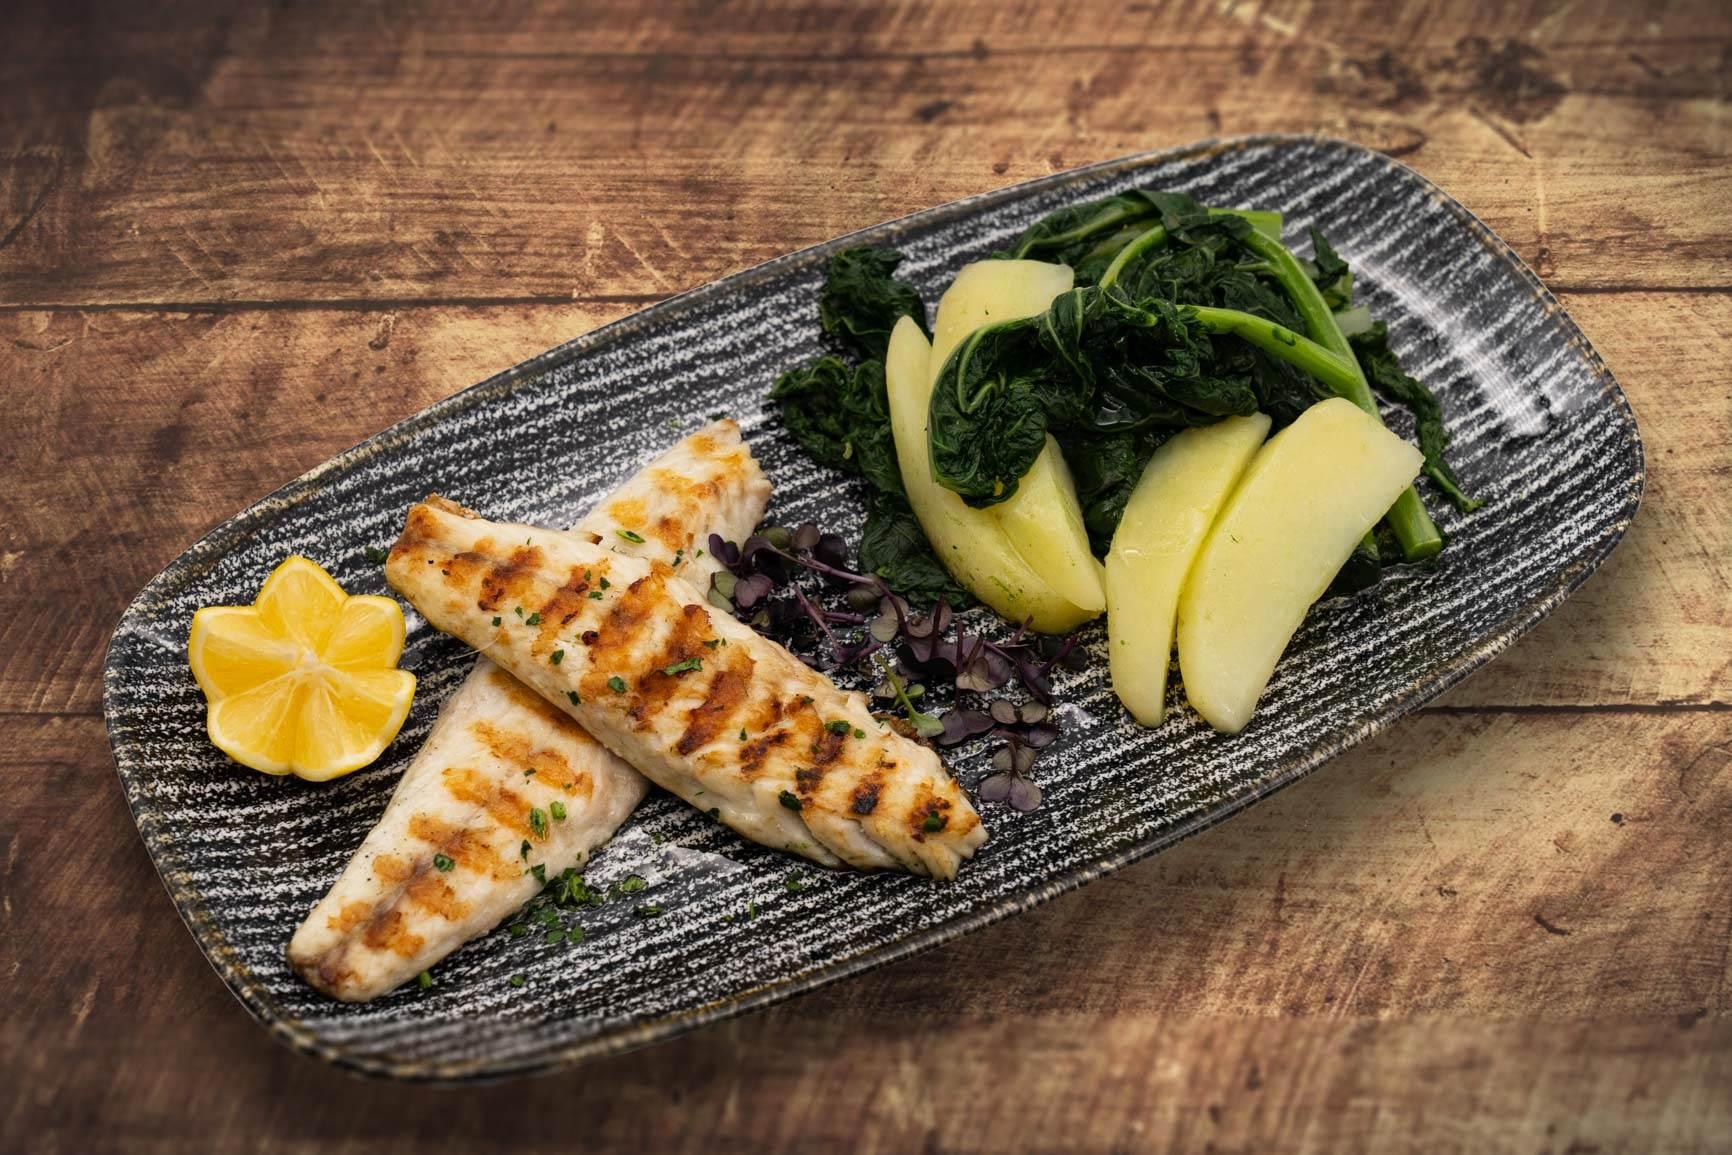 Riba sa žara s kuhanom raštikom i krumpirom